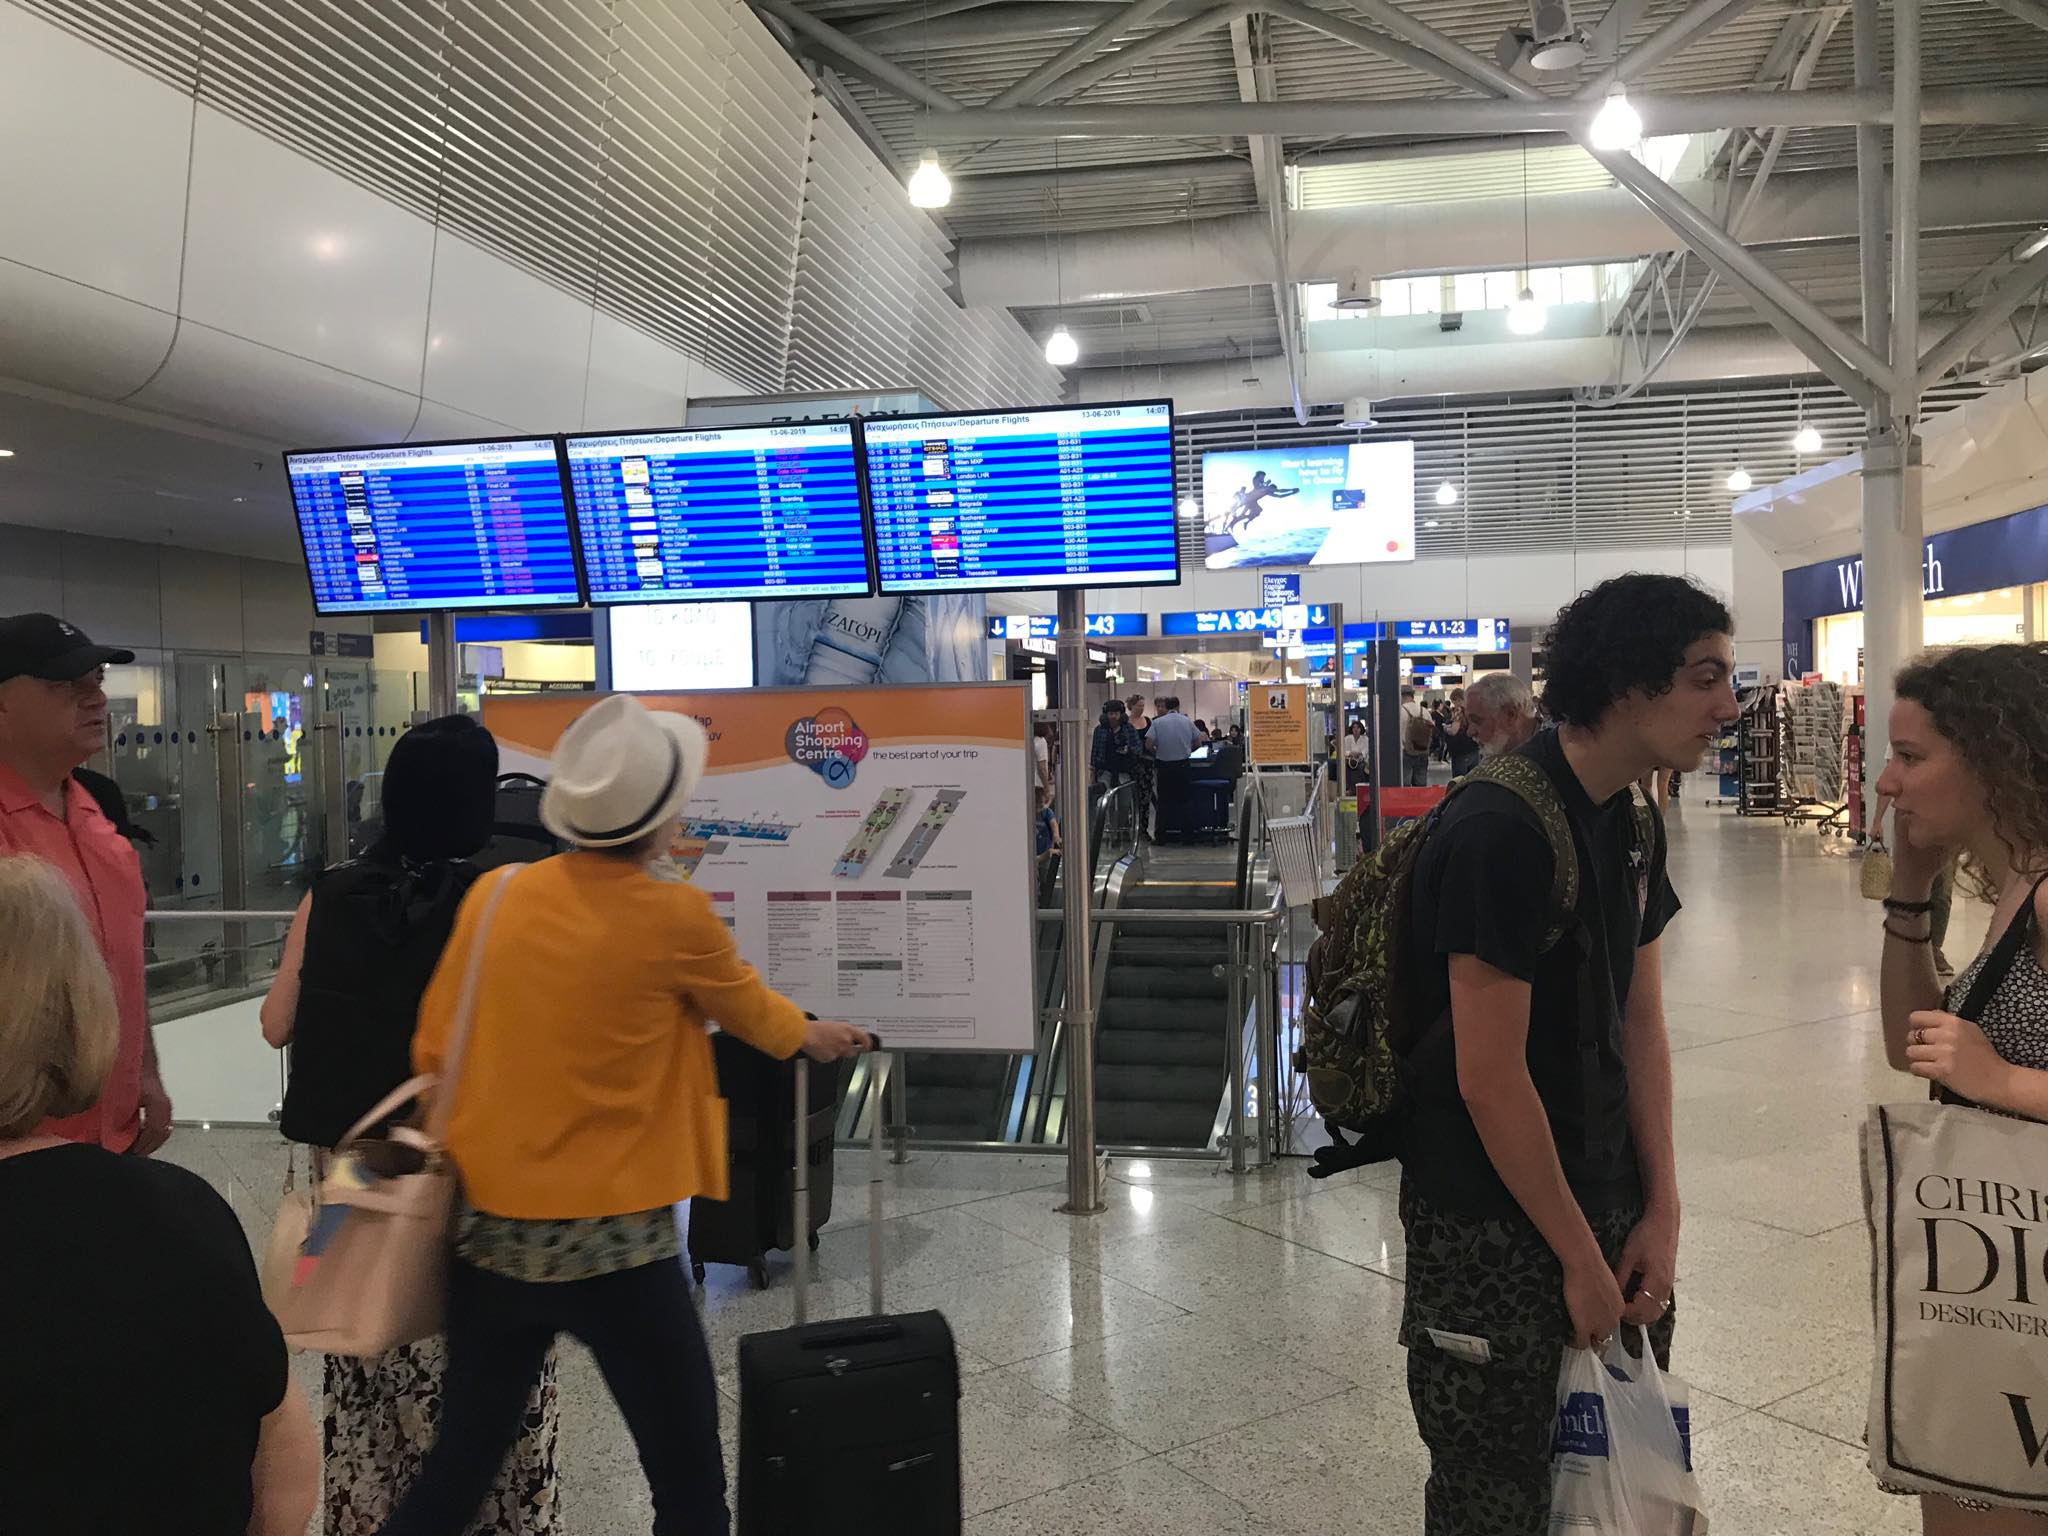 Eurostat – Η Ελλάδα είxε τη μικρότερη μείωση πτήσεων στην ΕΕ σε σύγκριση με το 2019.